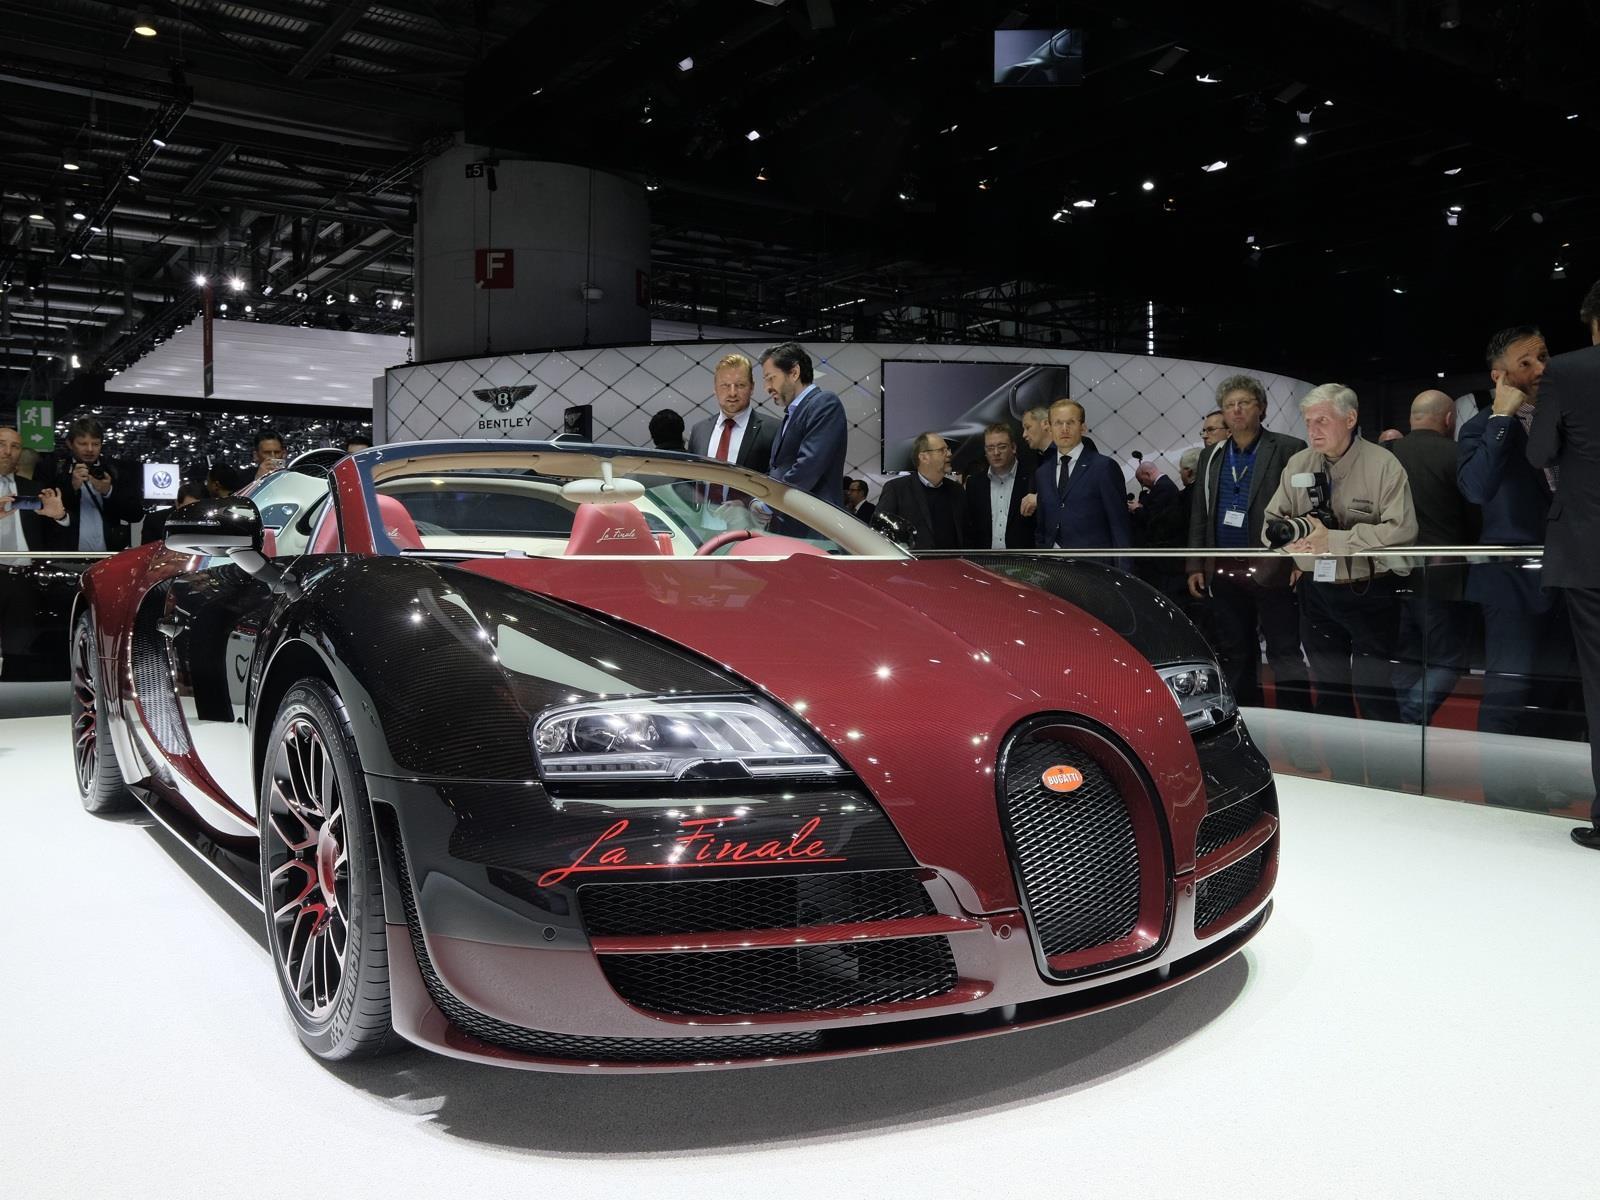 GAZ_bf3506058baa4390b39d58246df8cde8 Remarkable Bugatti Veyron Grand Sport Vitesse Informacion Cars Trend